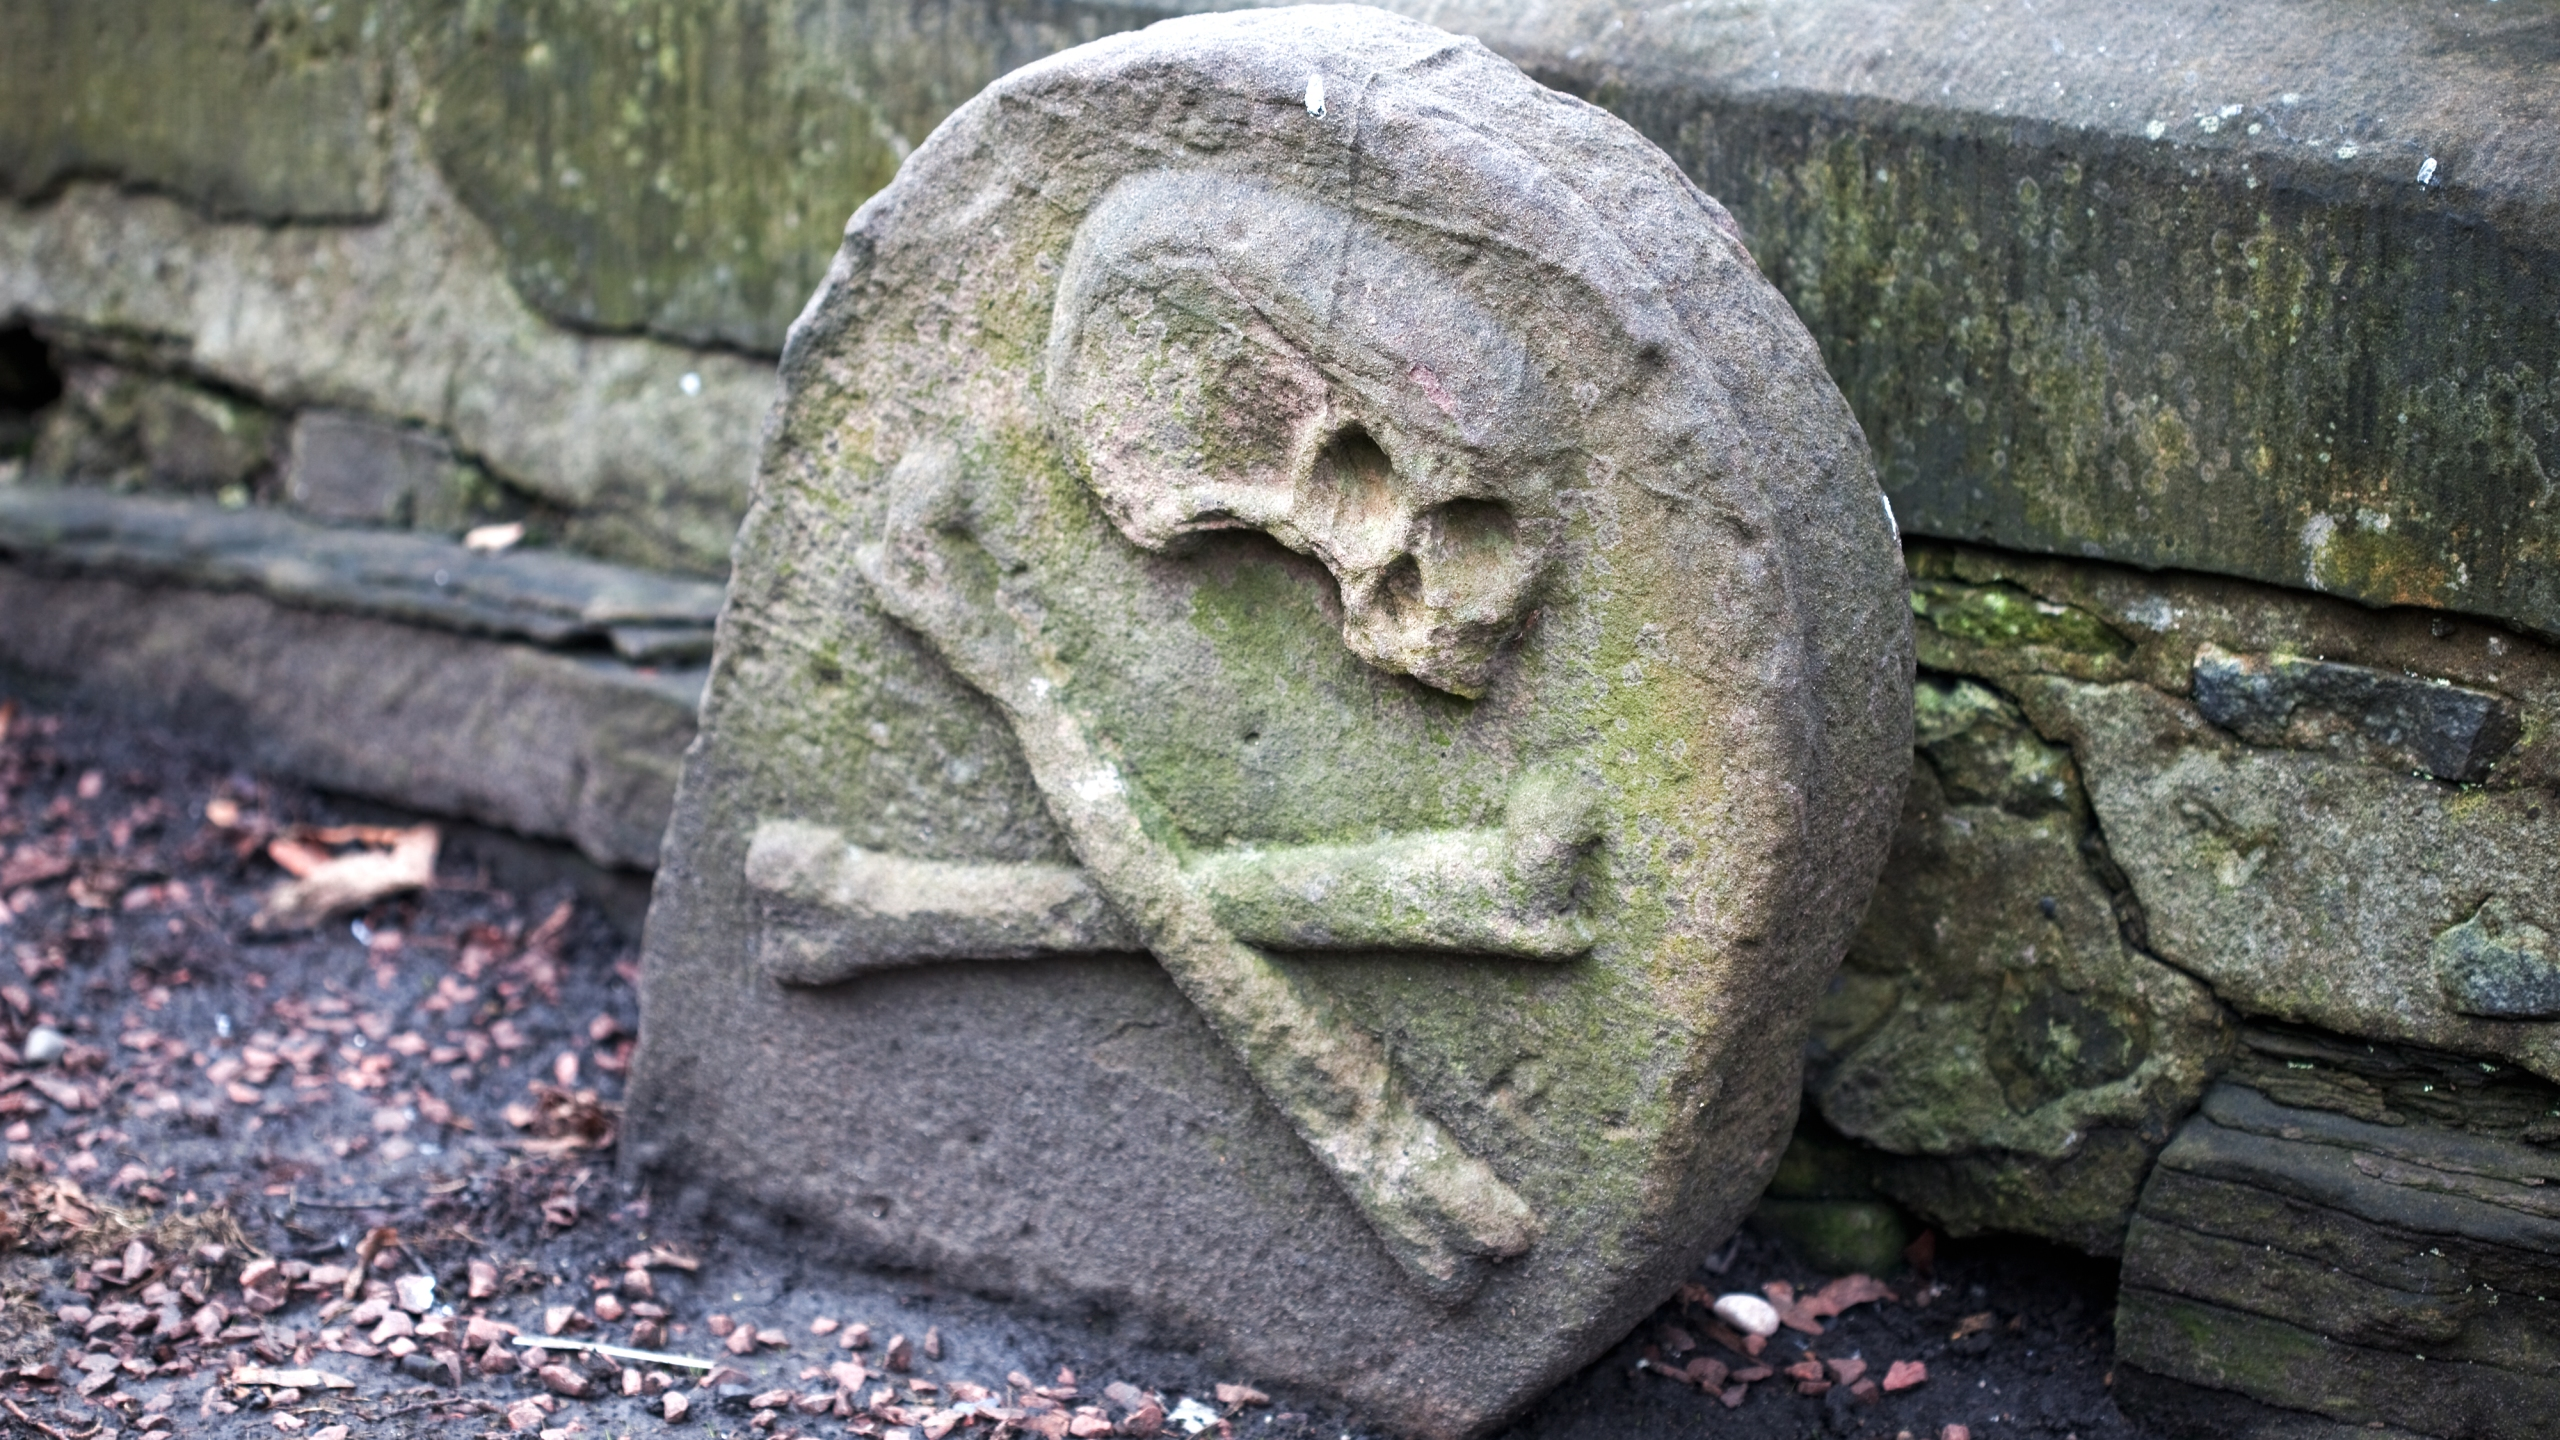 Grave of Black Death victim, Greyfriars cemetery, Edinburgh. (Getty Images)